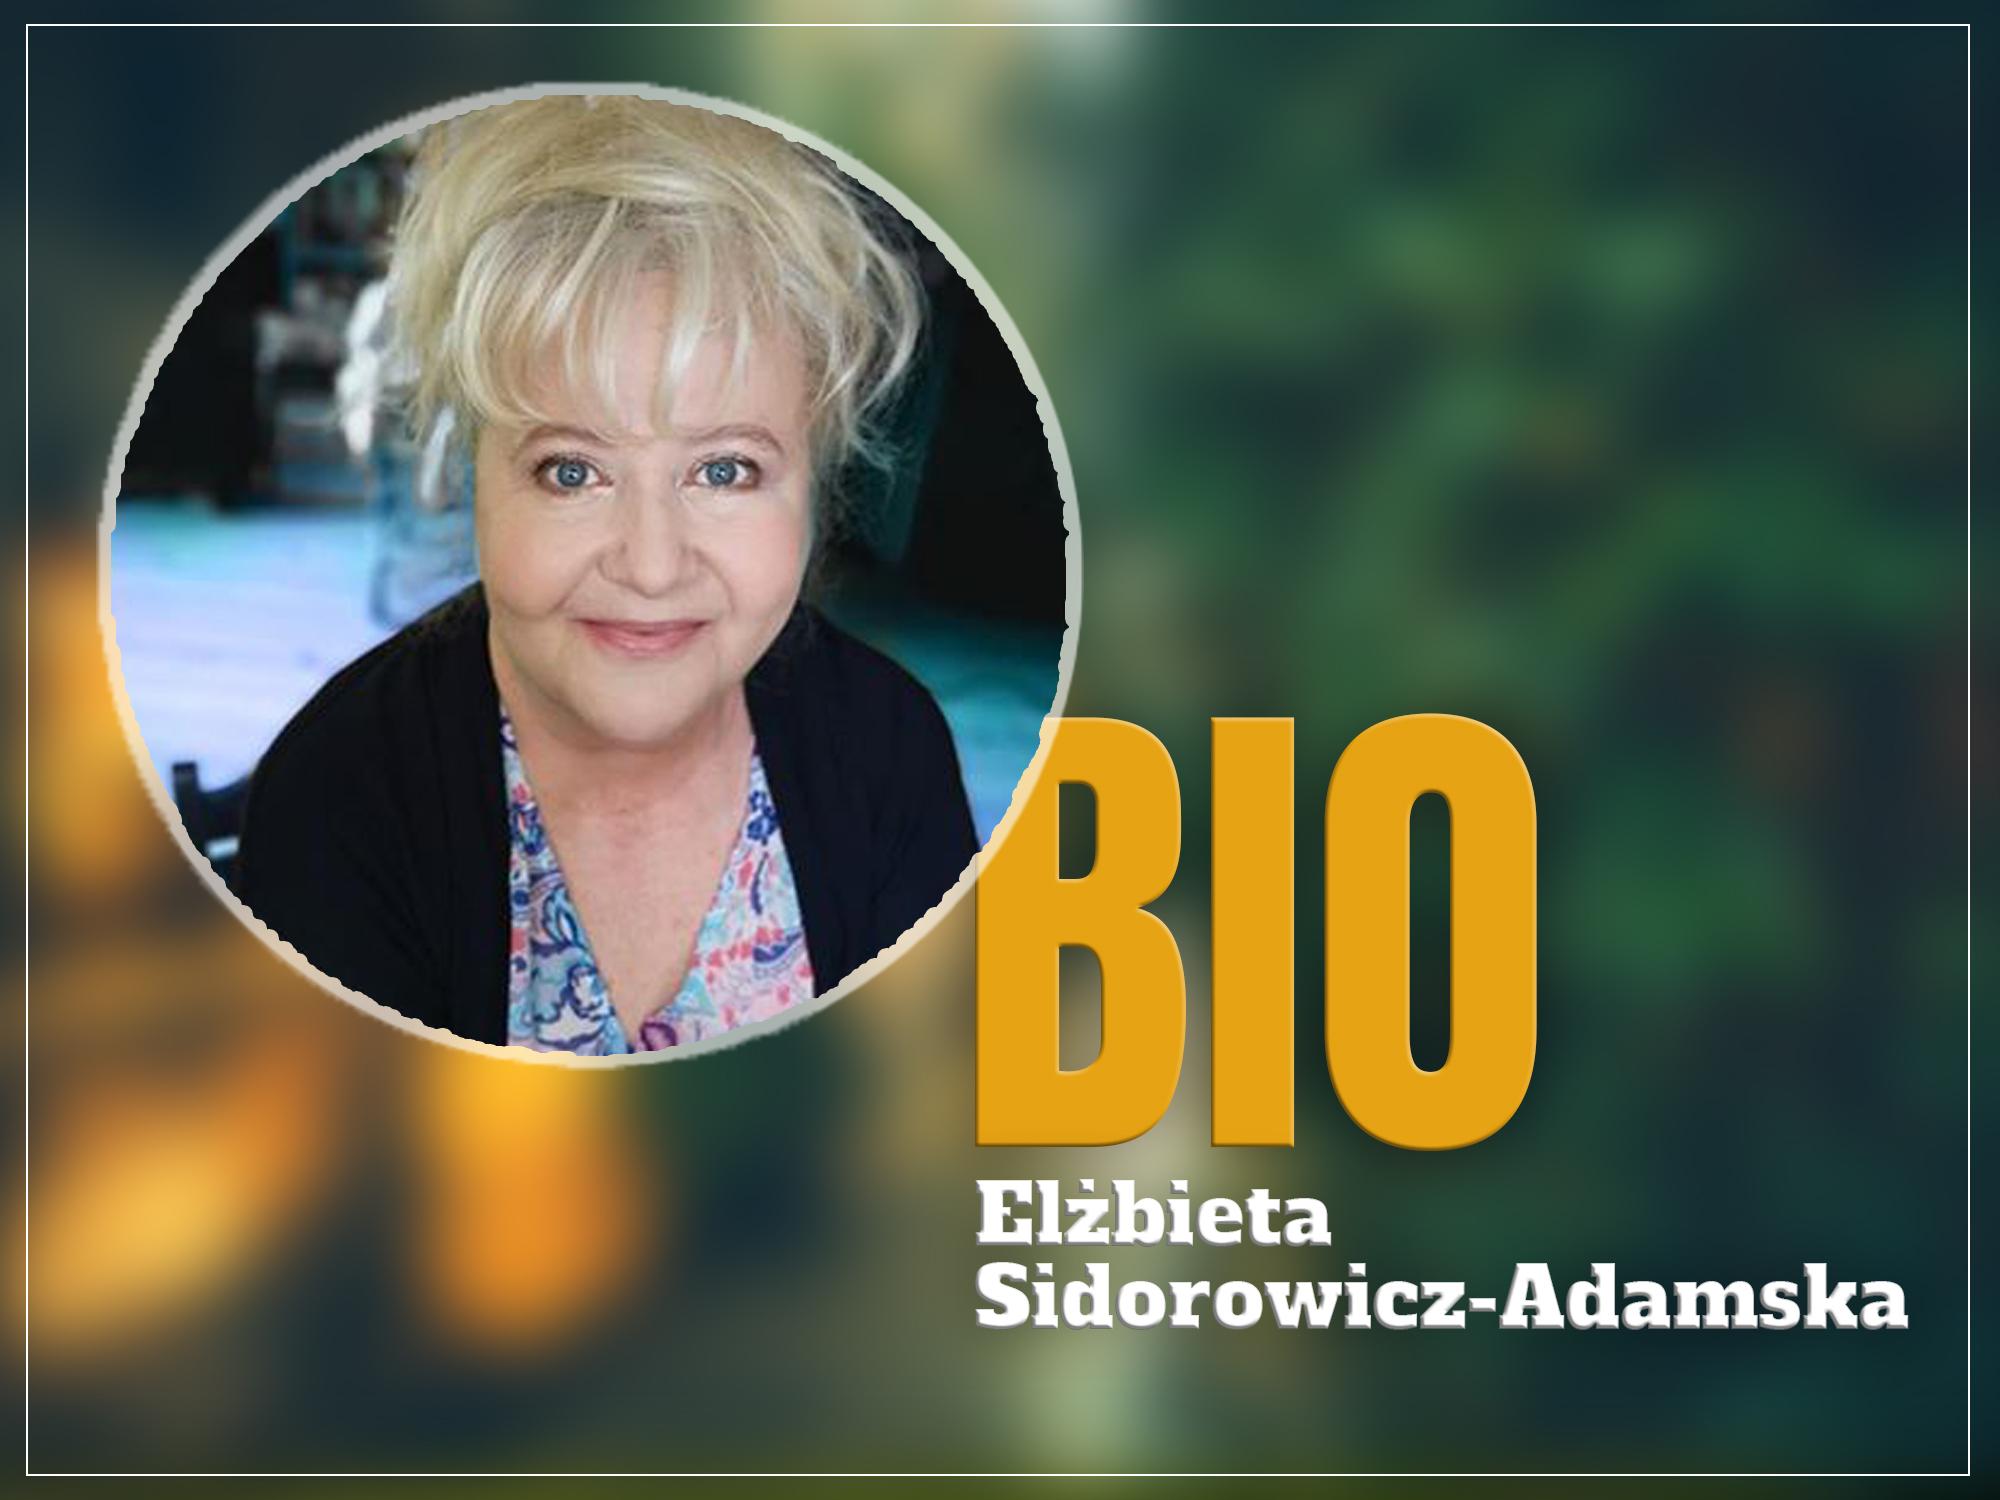 Elżbieta-Sidorowicz-Adamska